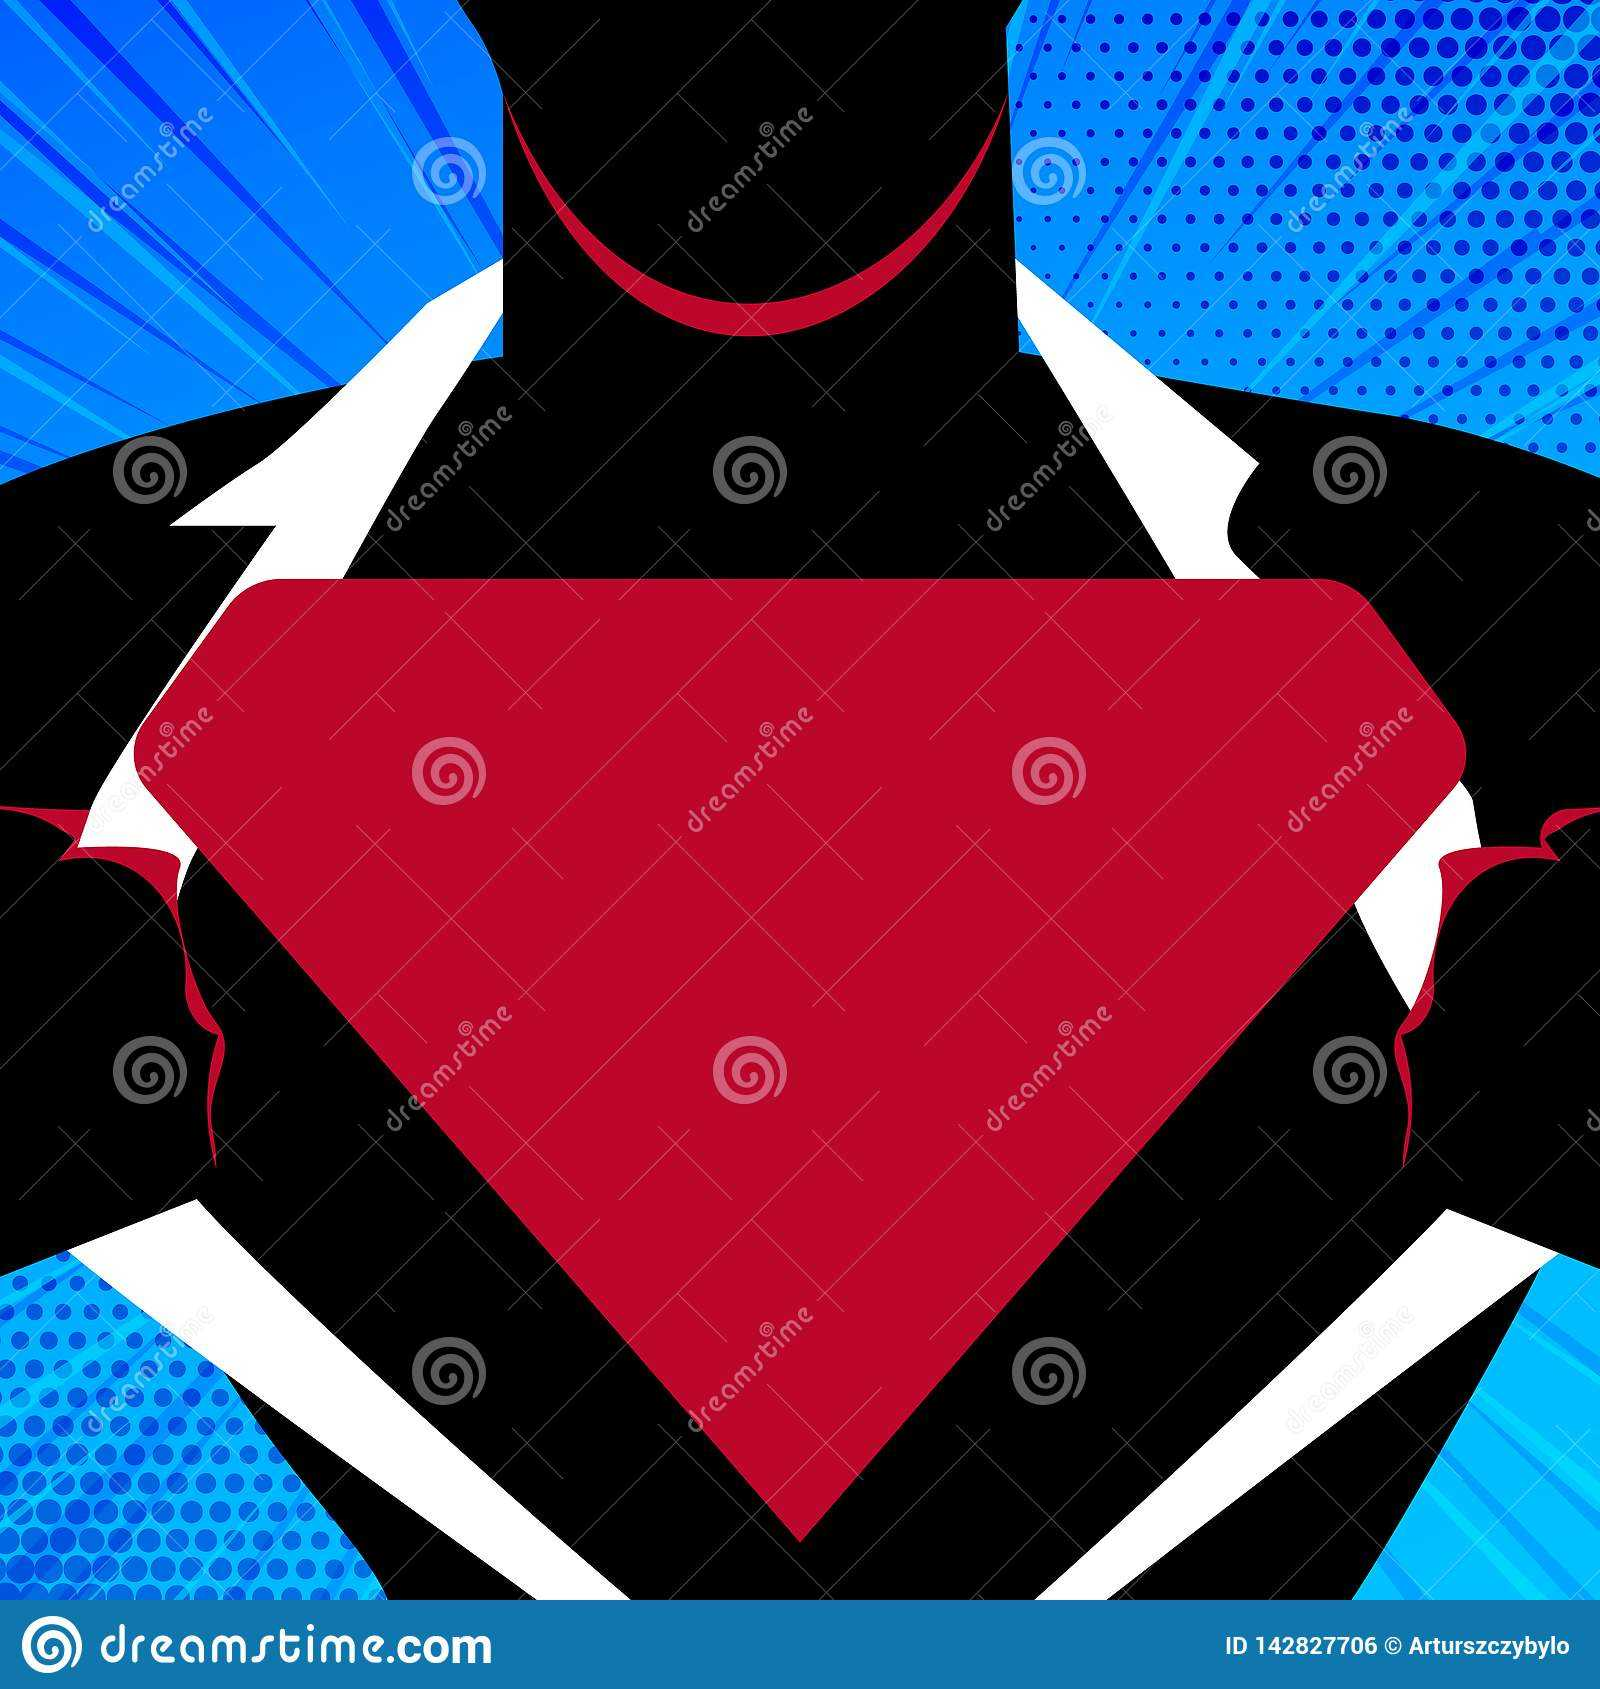 Man In Superman Pose Opening Shirt To Reveal Blank Throughout Blank Superman Logo Template